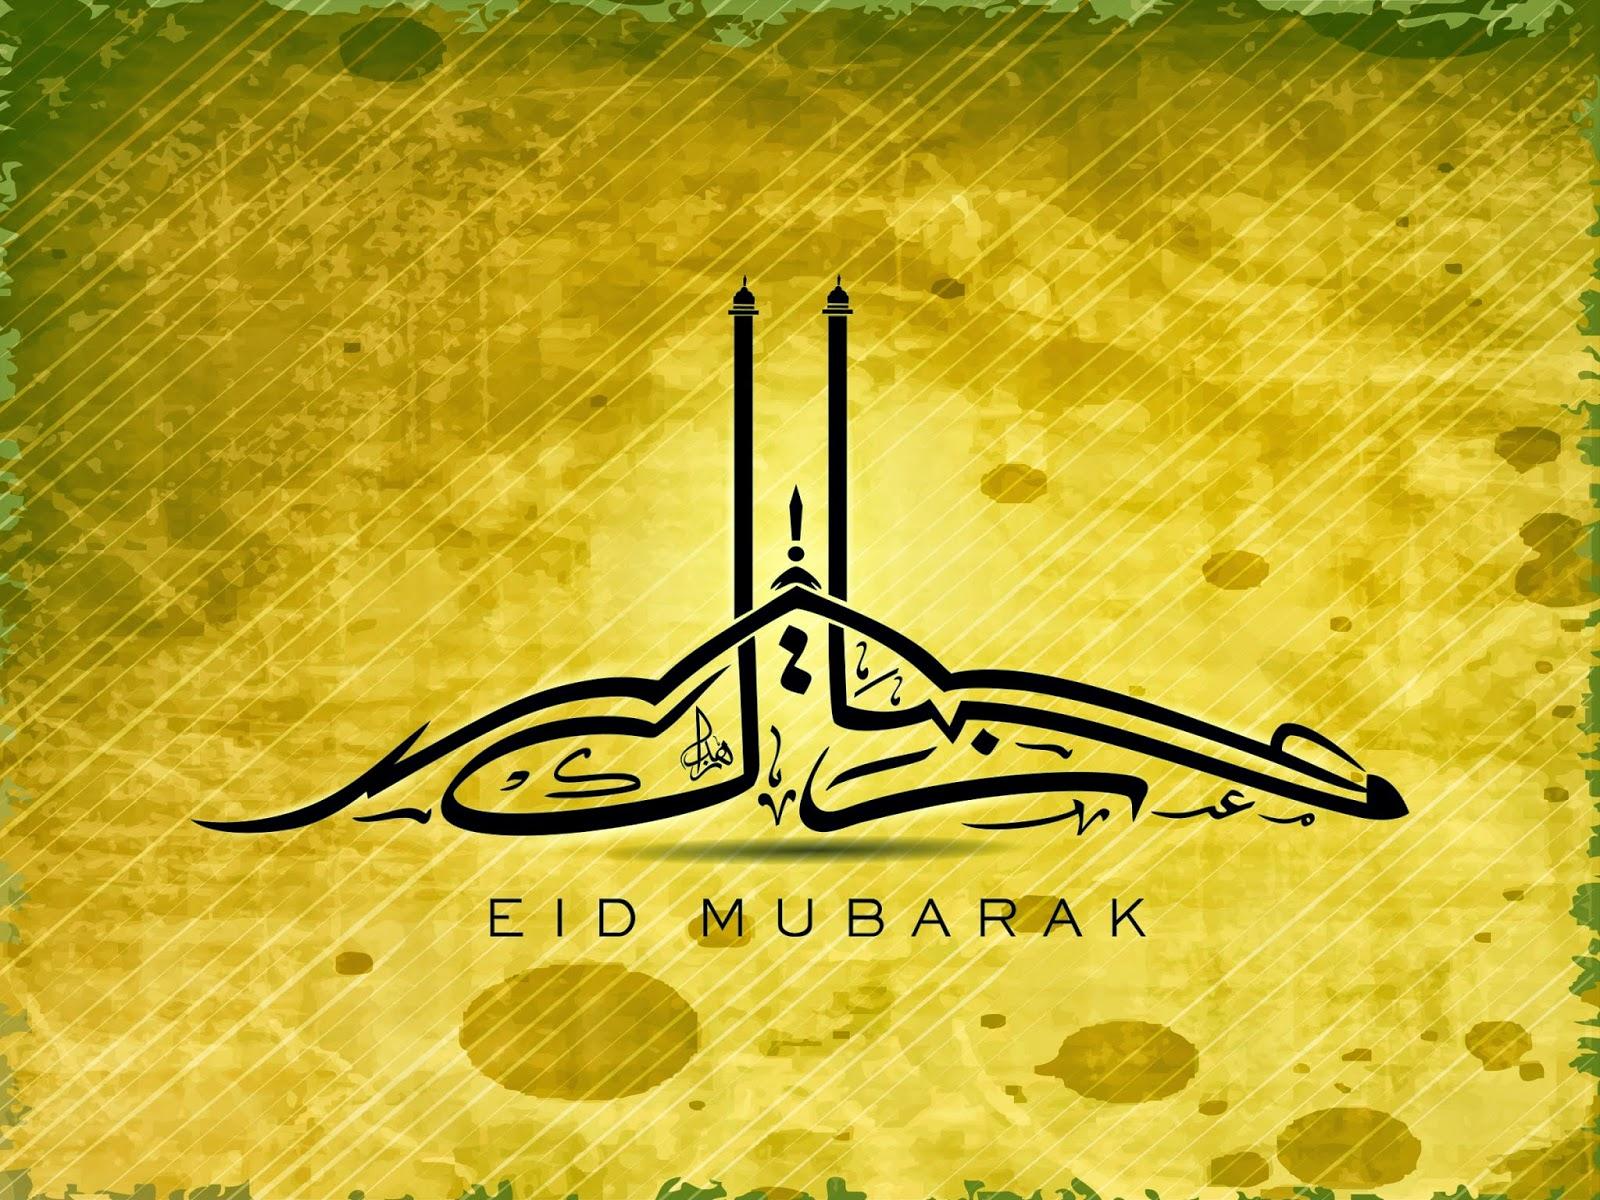 Eid mubarak wallpapers in arabic for saudi arabiauaeiraqegypt httpeidulfitrmubarakspot201407eid m4hsunfo Images